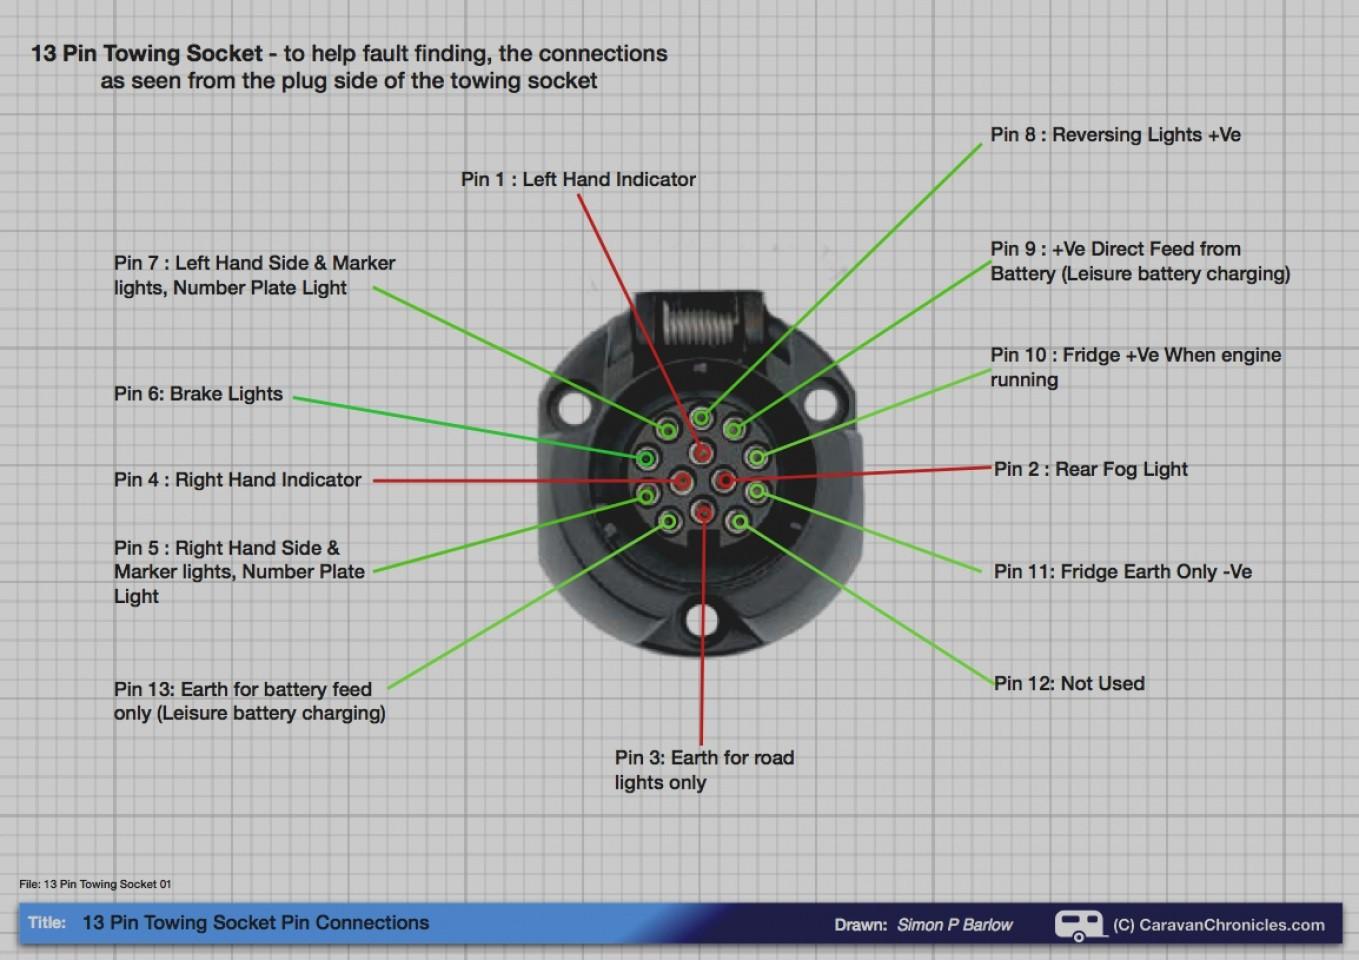 Cam Superline Trailer Wiring Diagram Hella 500 Lights Wiring Diagram Tos30 Ikikik Jeanjaures37 Fr